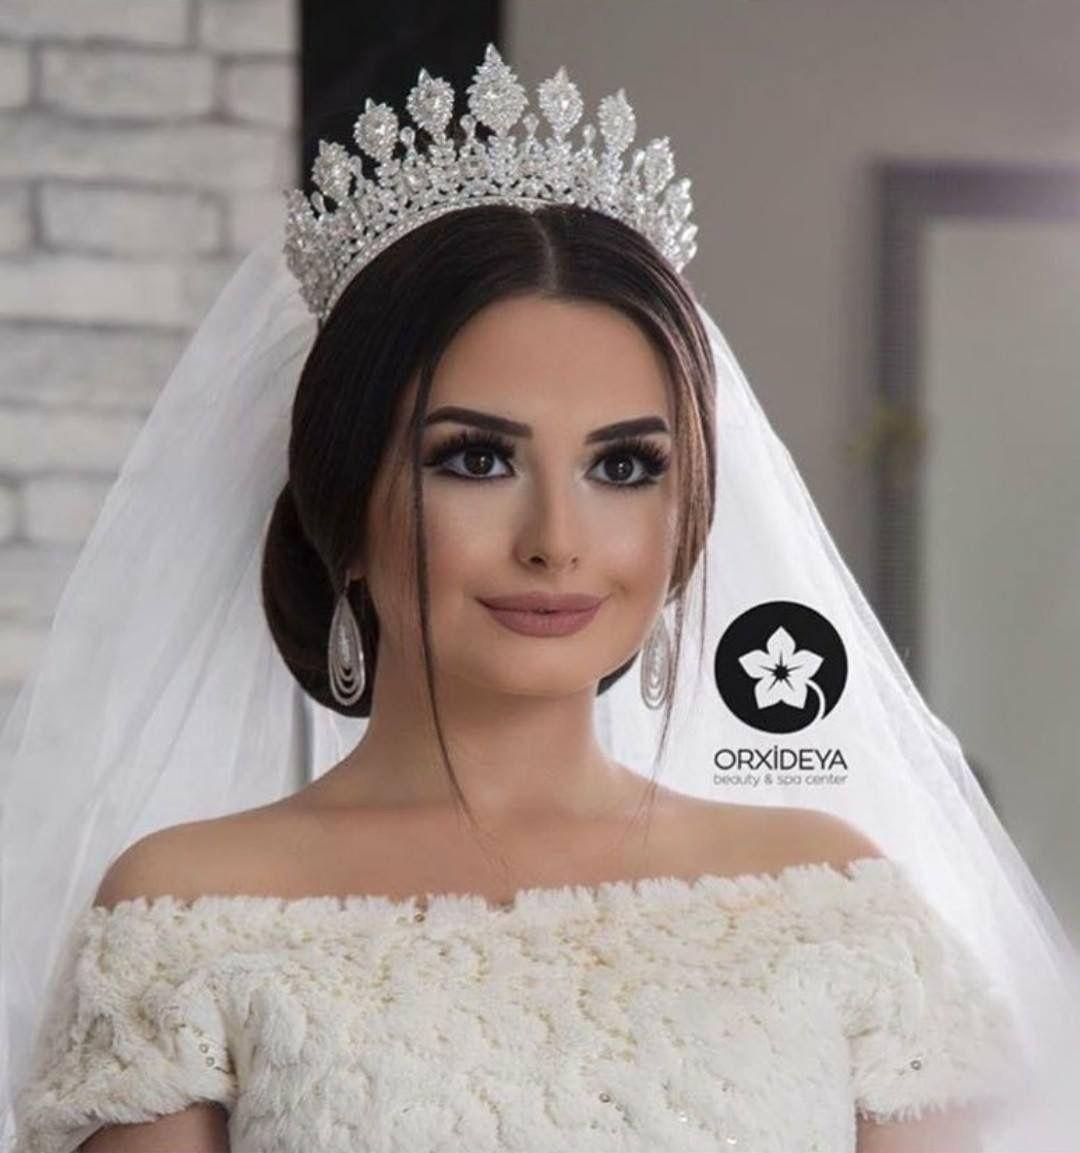 Pin De Kerlind Gonzalez En Matrimonio En 2020 Peinado De Novia Recogidos Adornos Pelo Novia Novios Boda